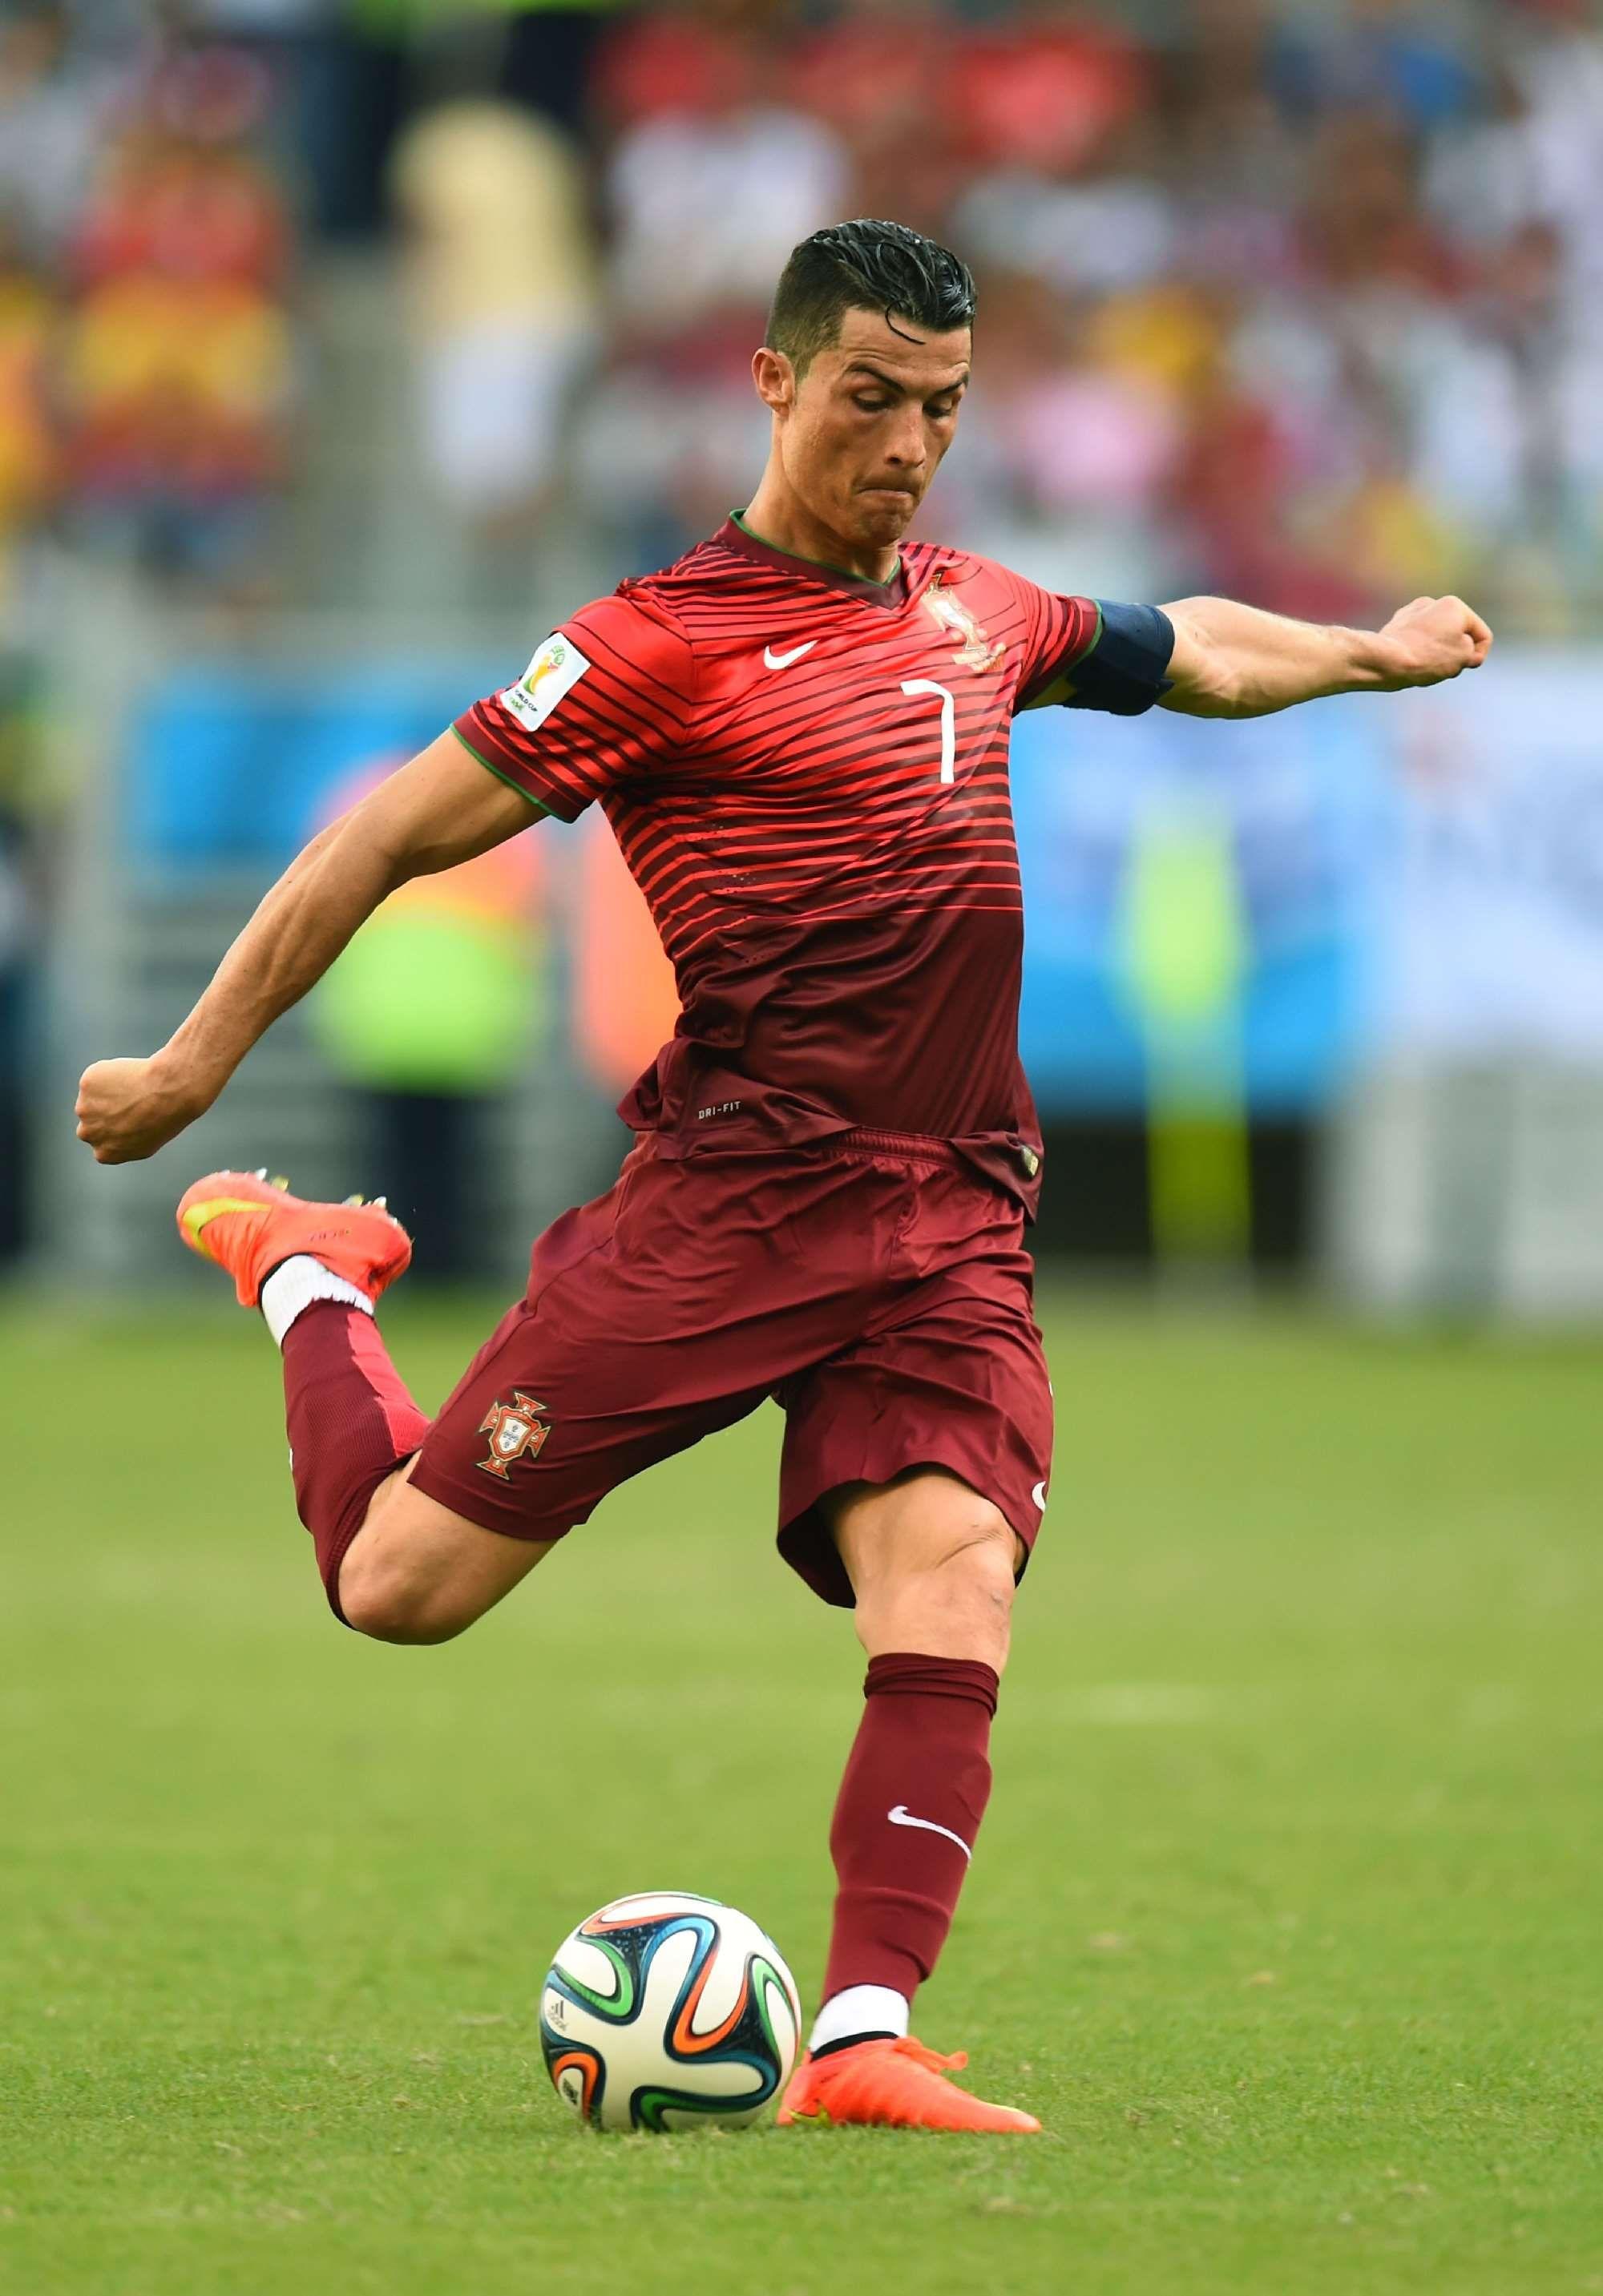 Hd wallpaper ronaldo - Cristiano Ronaldo Iphone Wallpapers